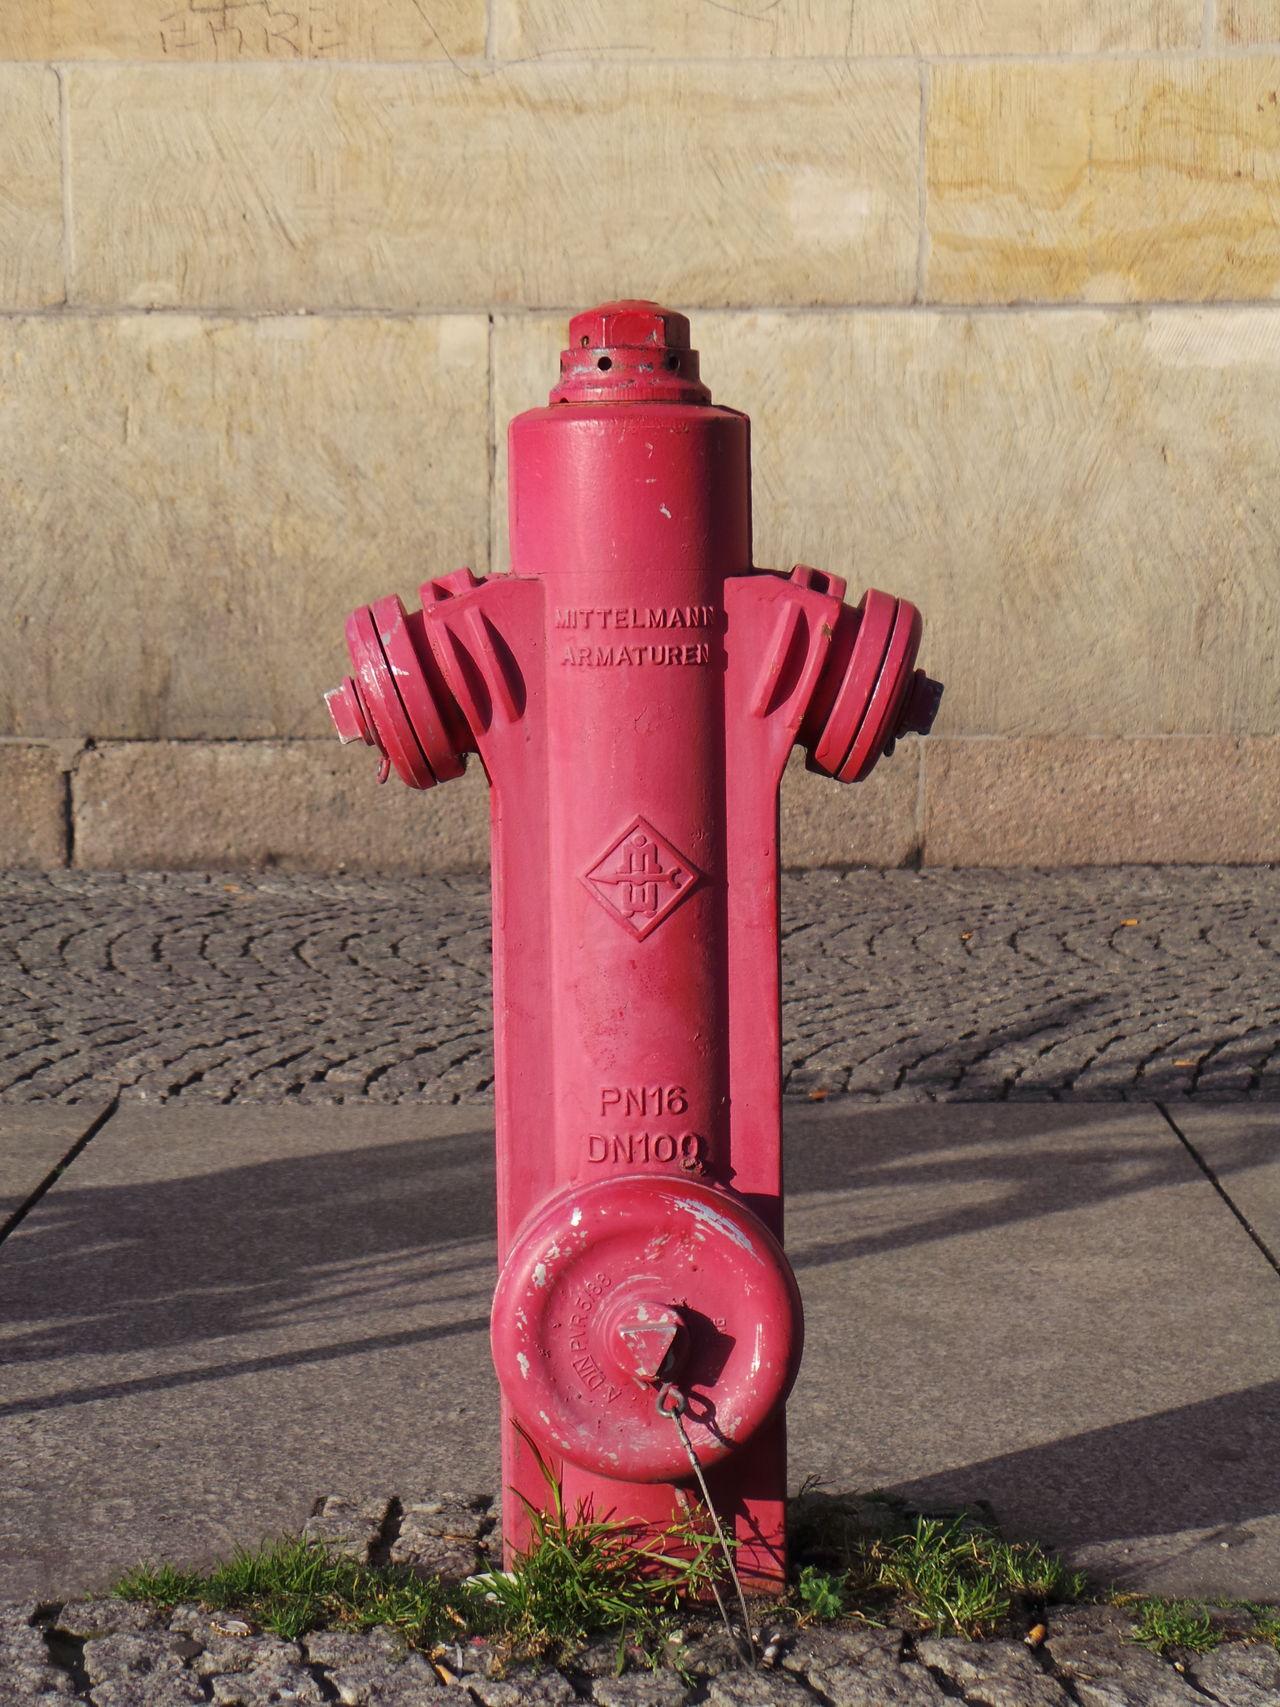 Feuer Feuerwehr Fire Fire Hydrant Fire Plug Fire Service Fireplug Hydrant Leipzig Red Rot Wasser Water